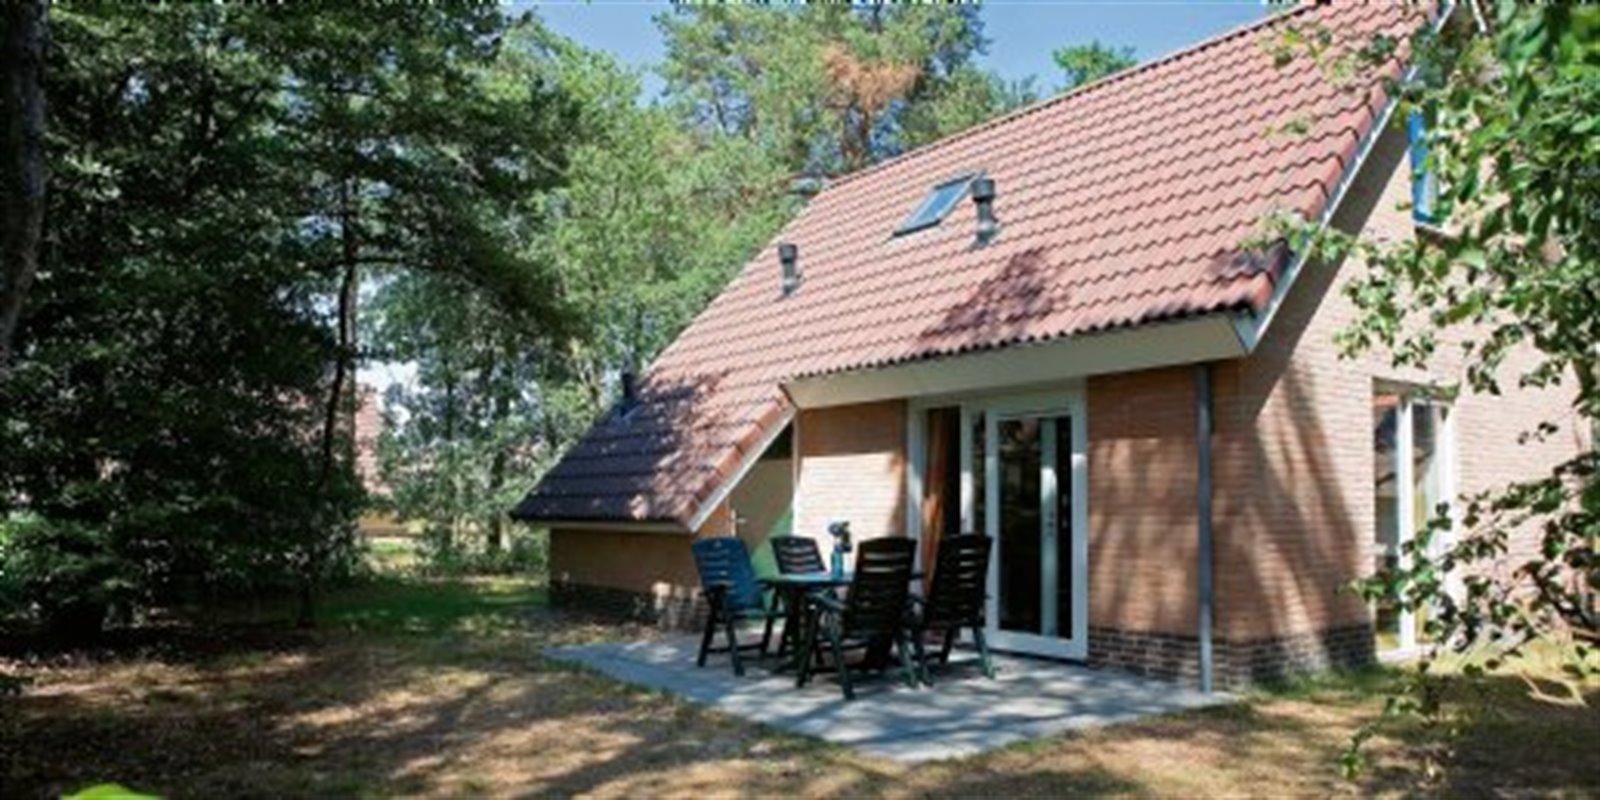 Landal Twenhaarsveld | 4-Pers.-Ferienhaus - Lux...